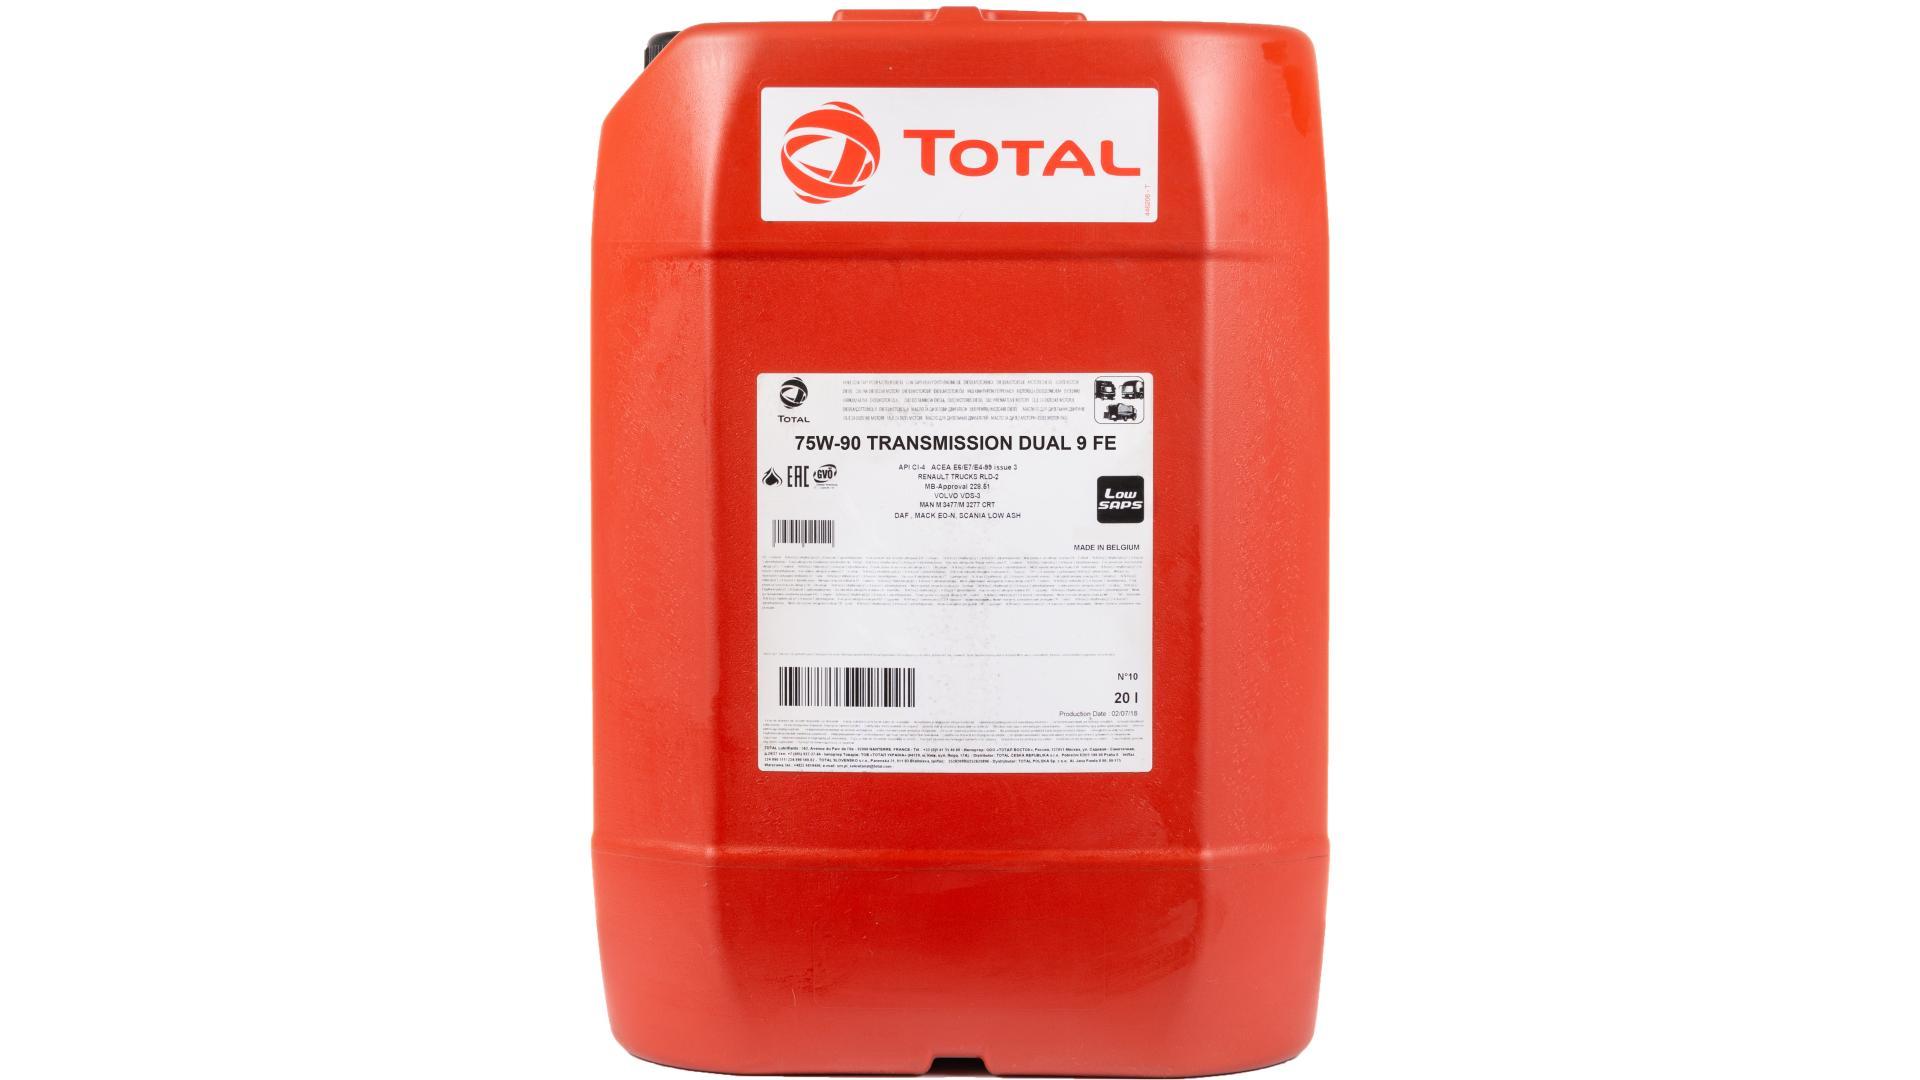 Total 75w-90 Transmission Dual 9 FE 20L (201657)